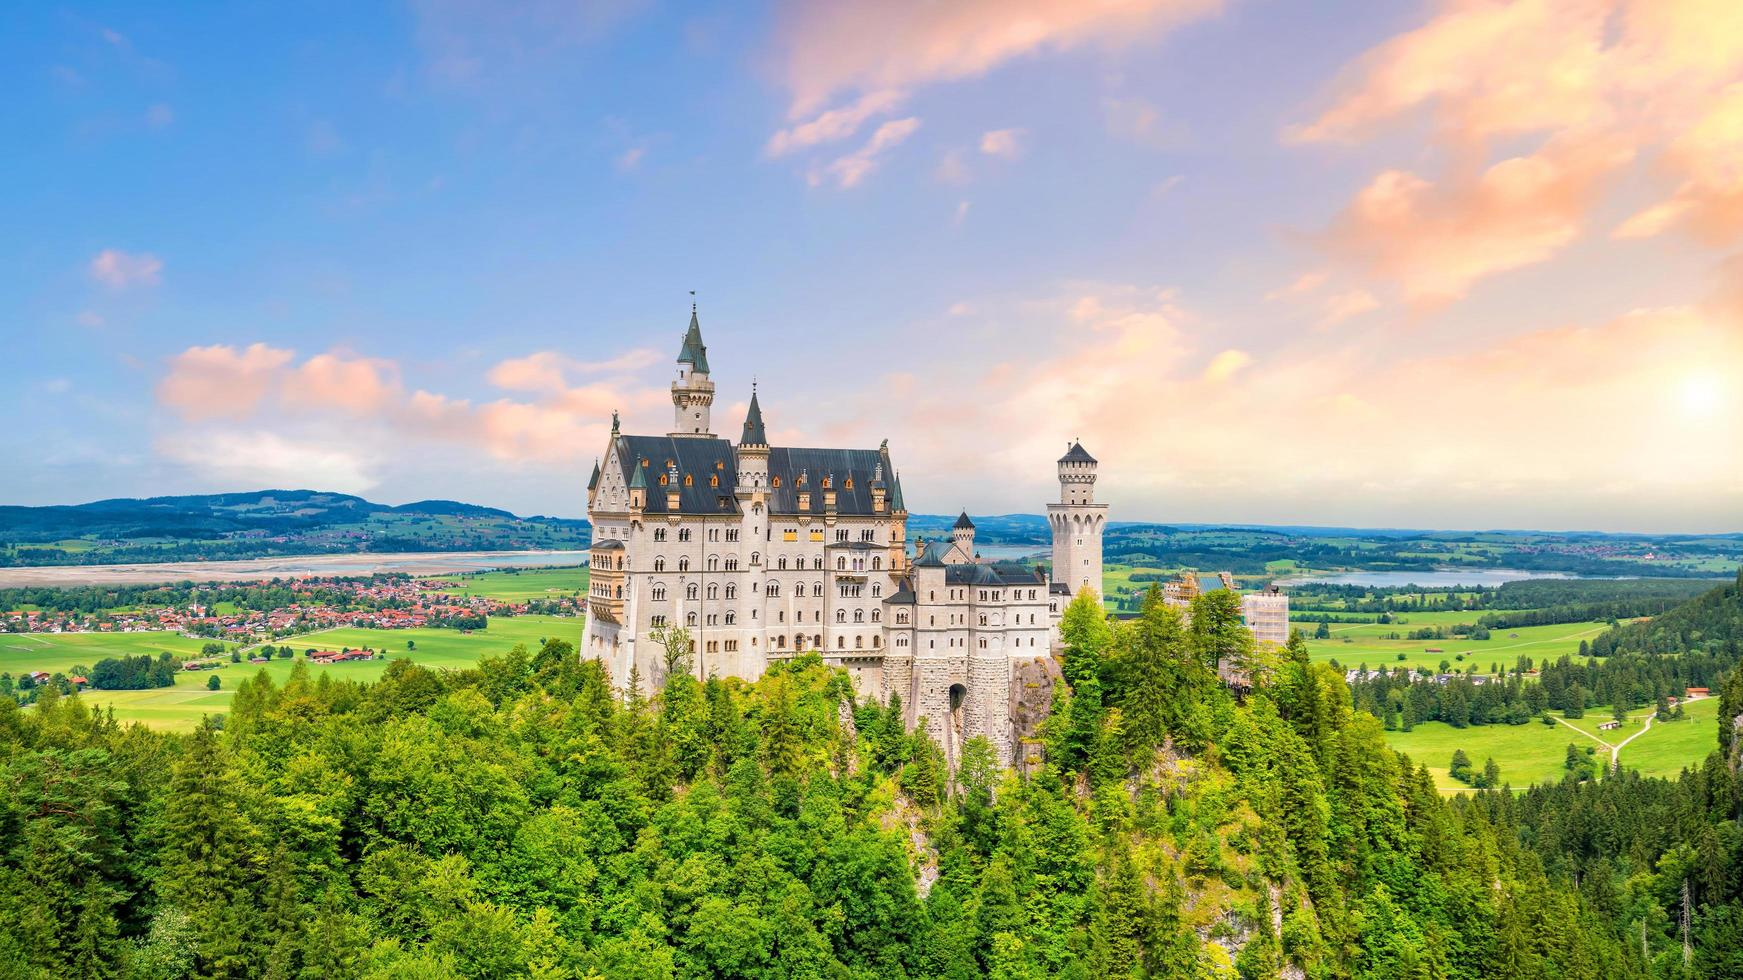 Château de Neuschwanstein de renommée mondiale, Allemagne photo